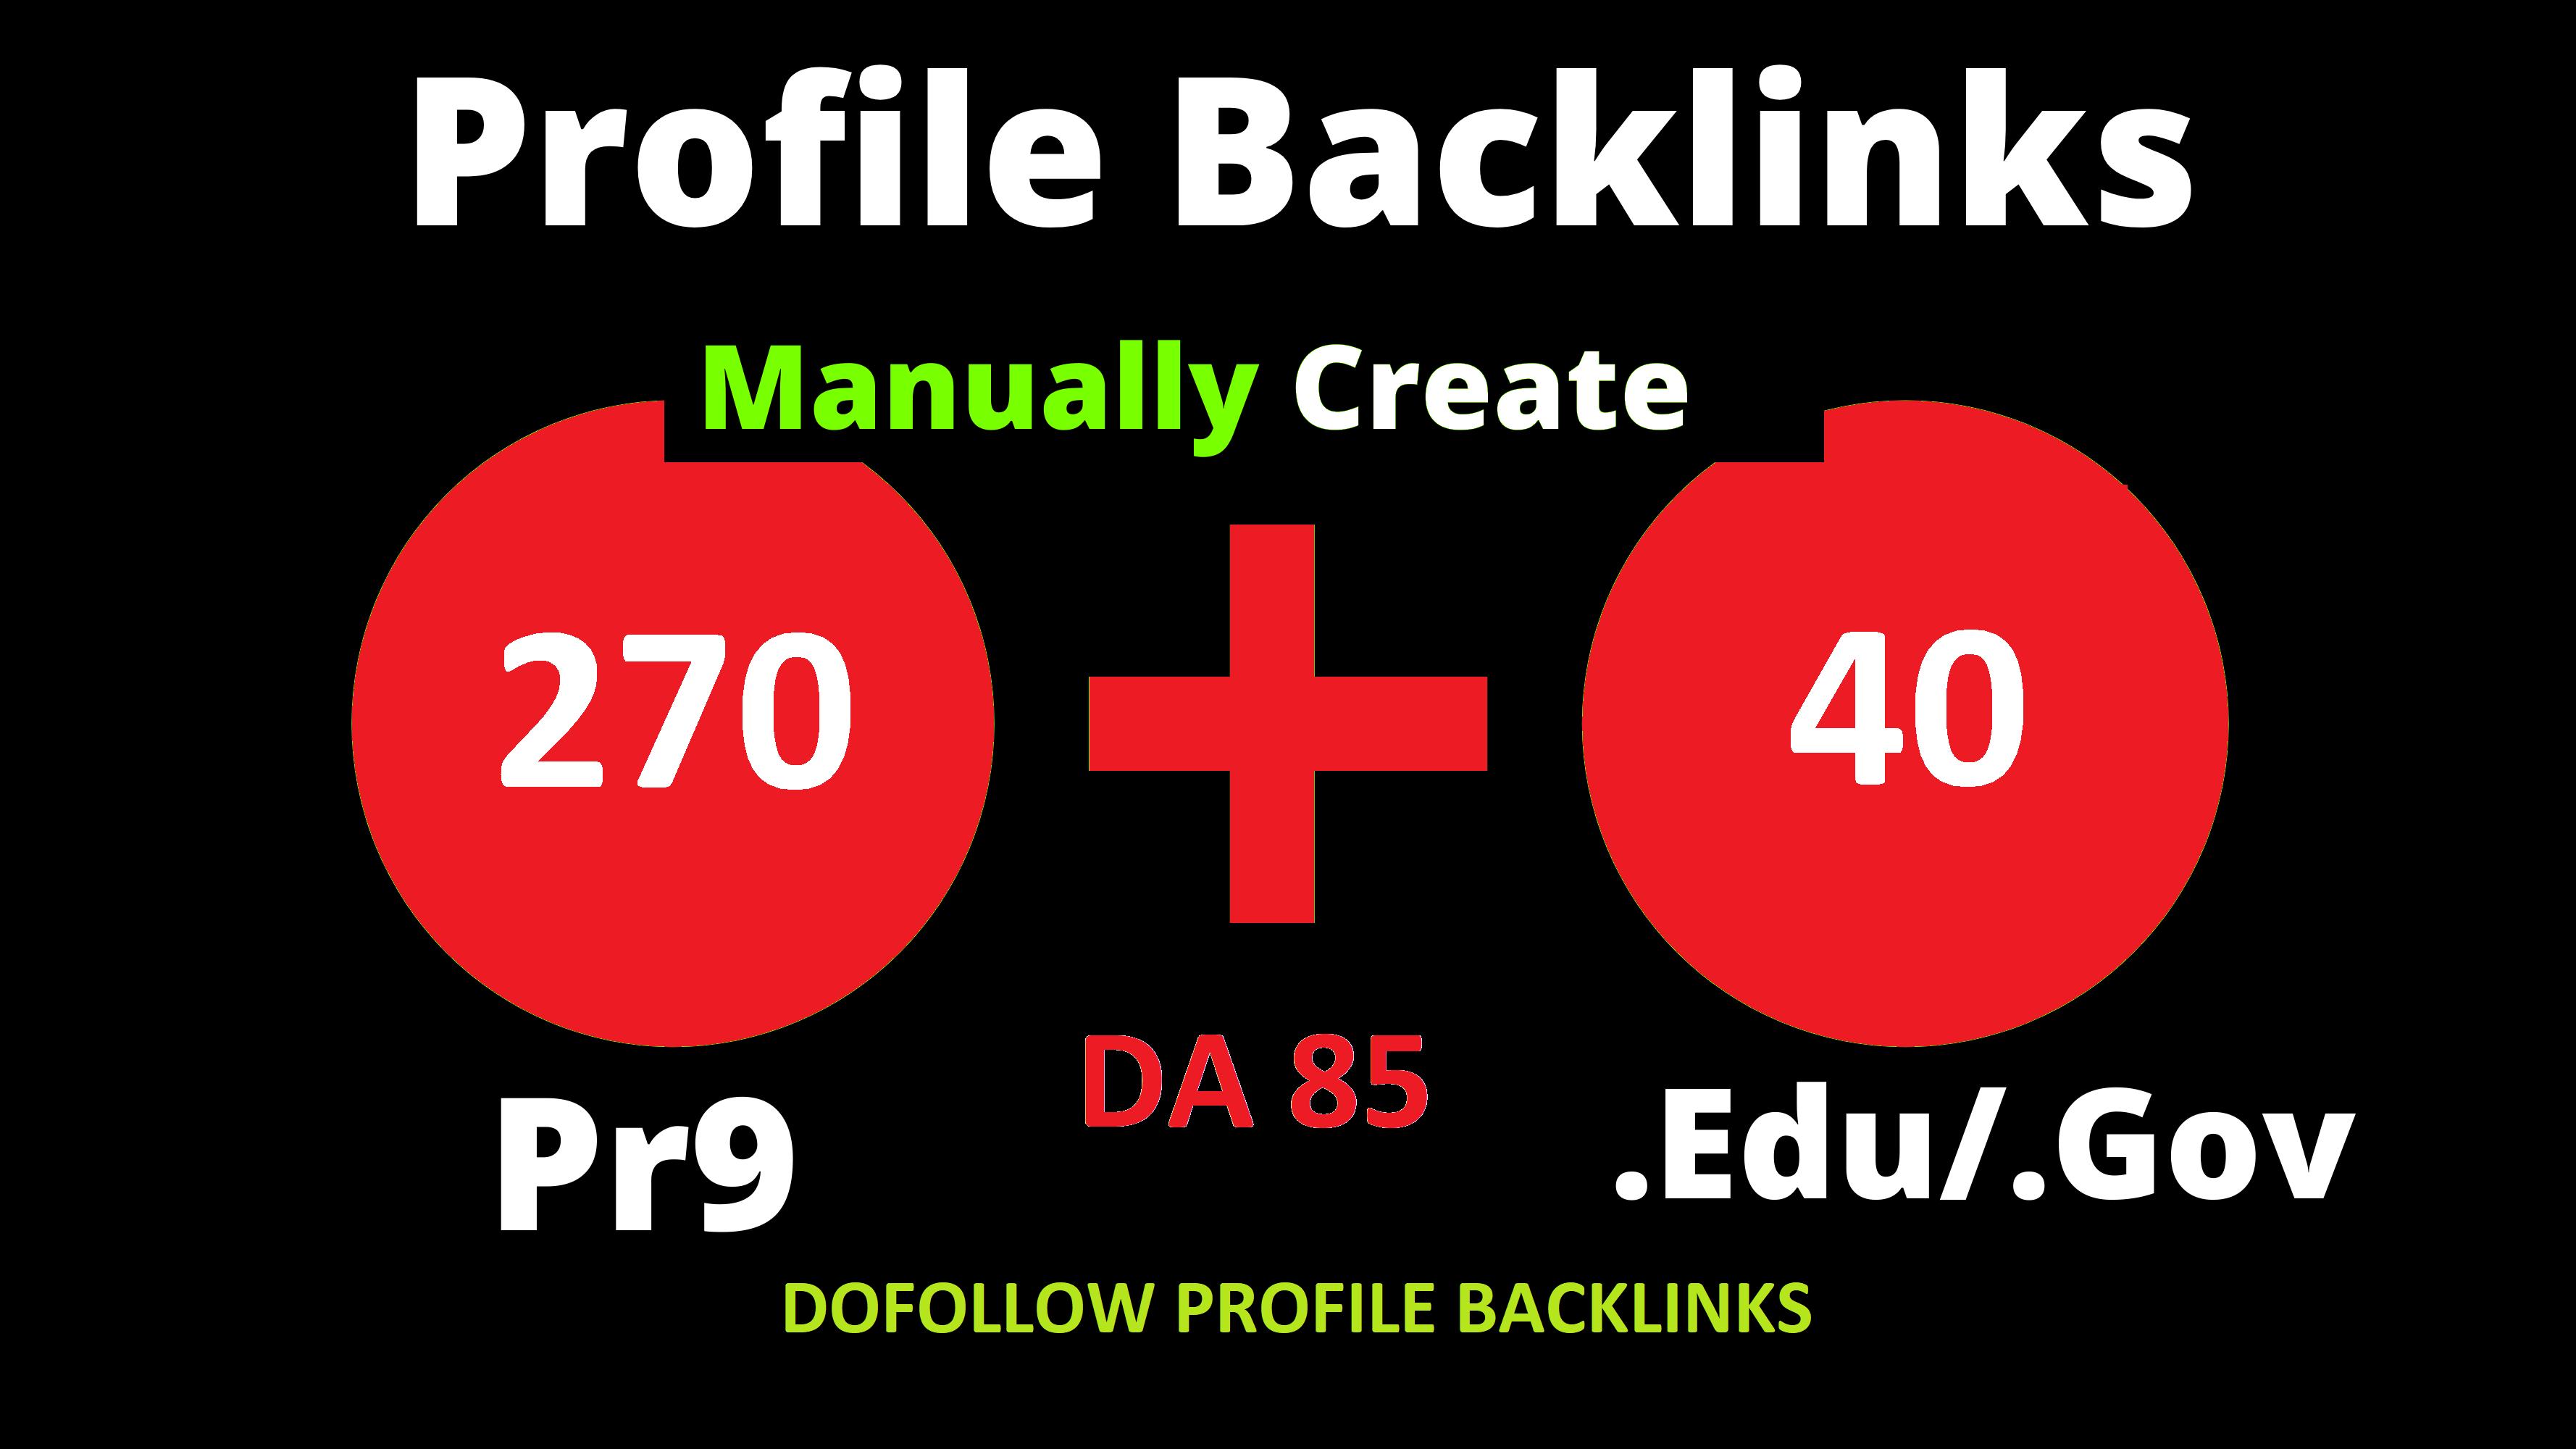 270 Pr9 + 40 Edu/Gov Pr9 High Authority Profile Backlinks To Boost Your Website Ranking 2021